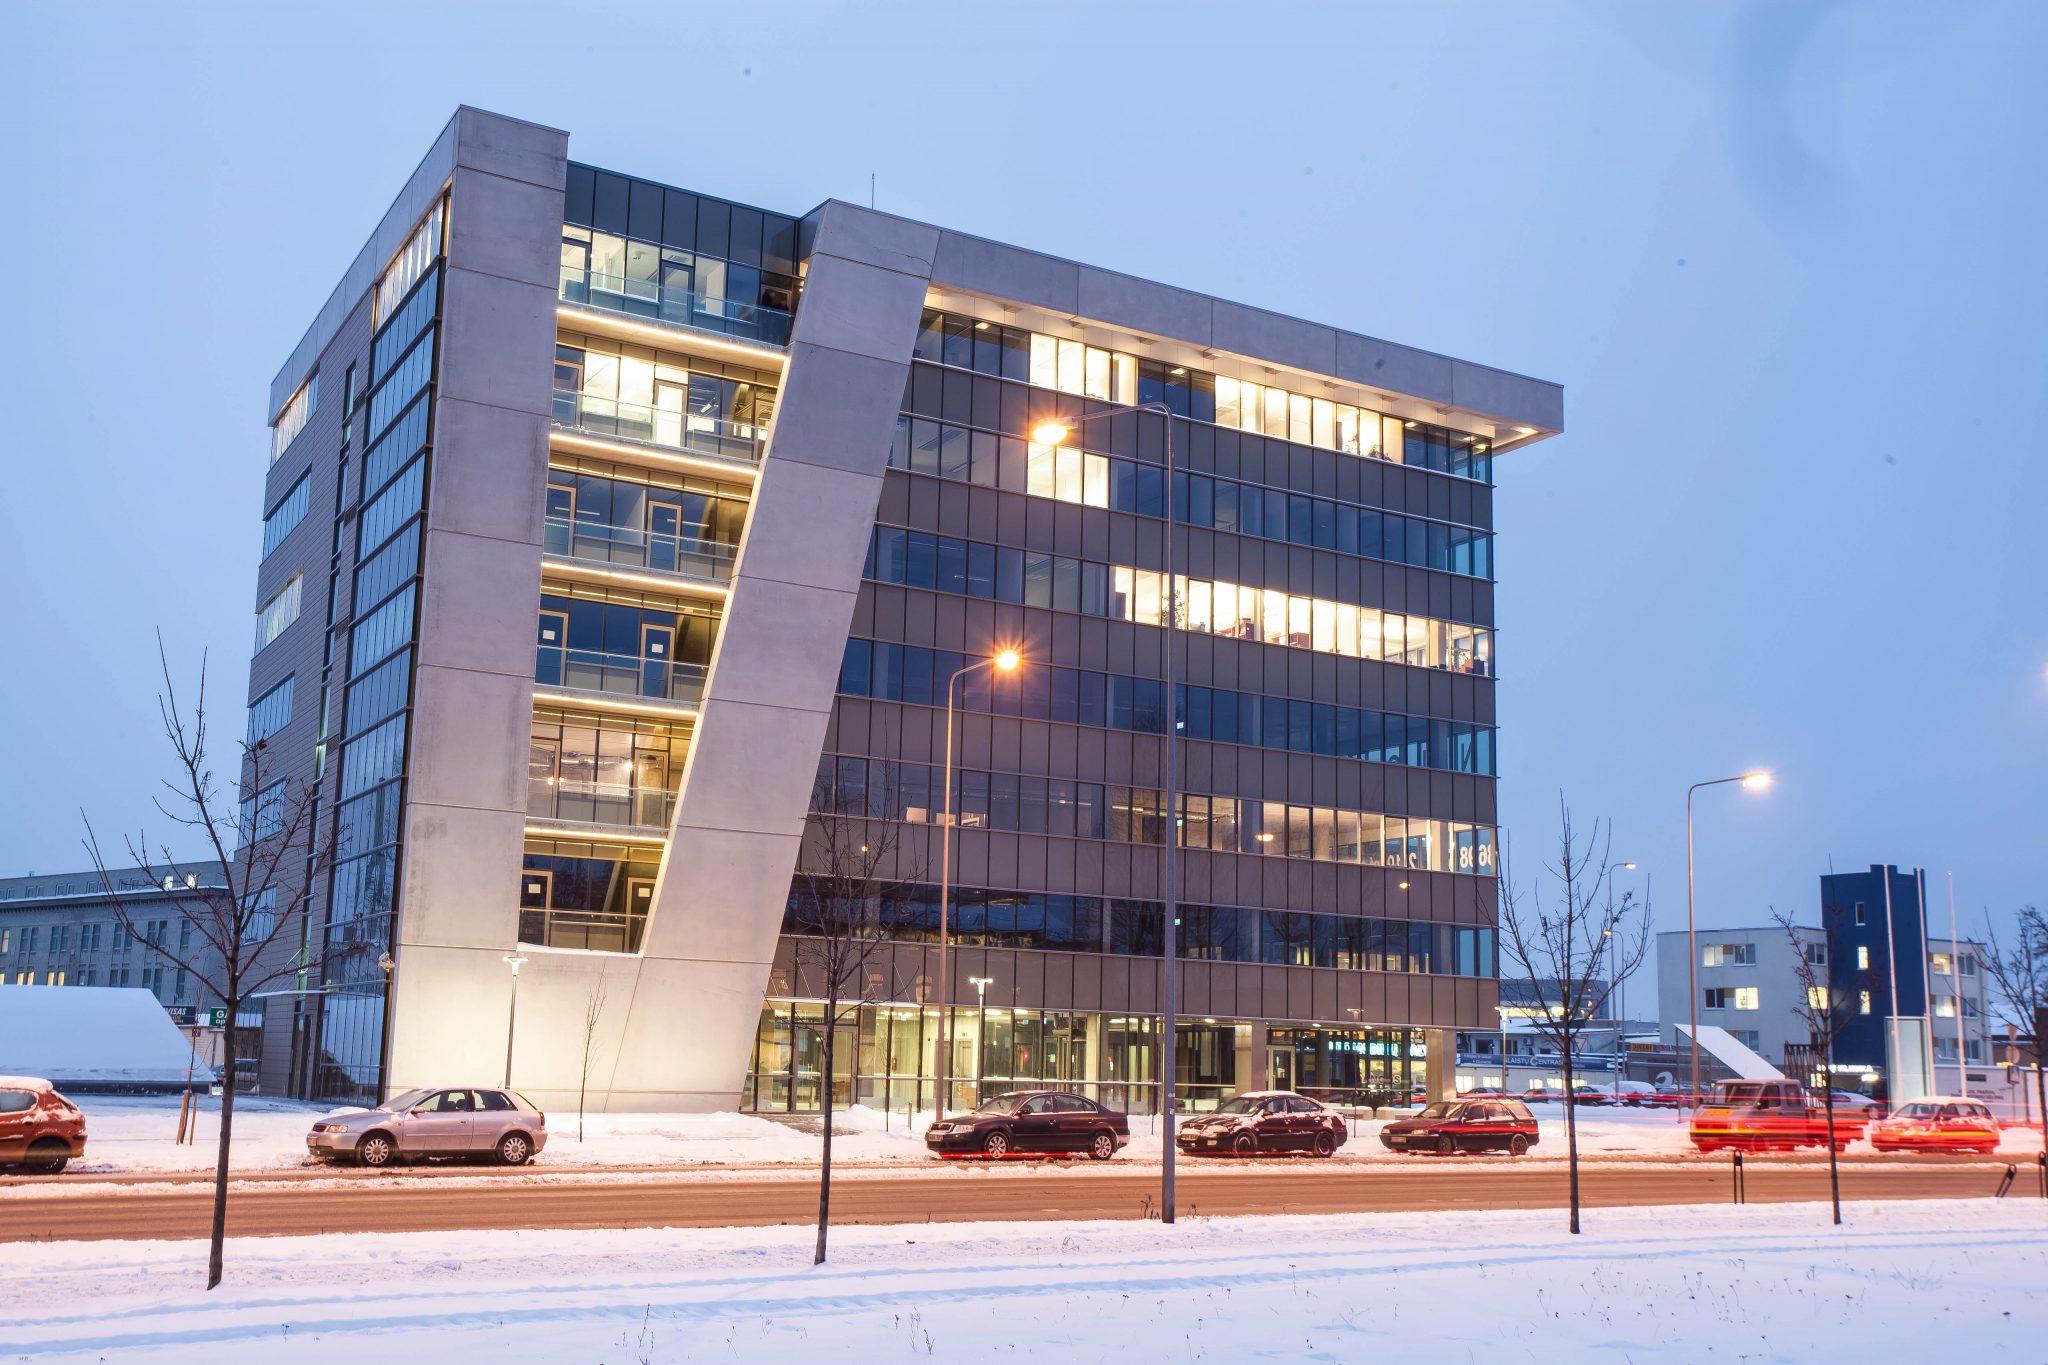 EfTEN Real Estate Fund III AS viis lõpule teise investeeringu Vilniuses